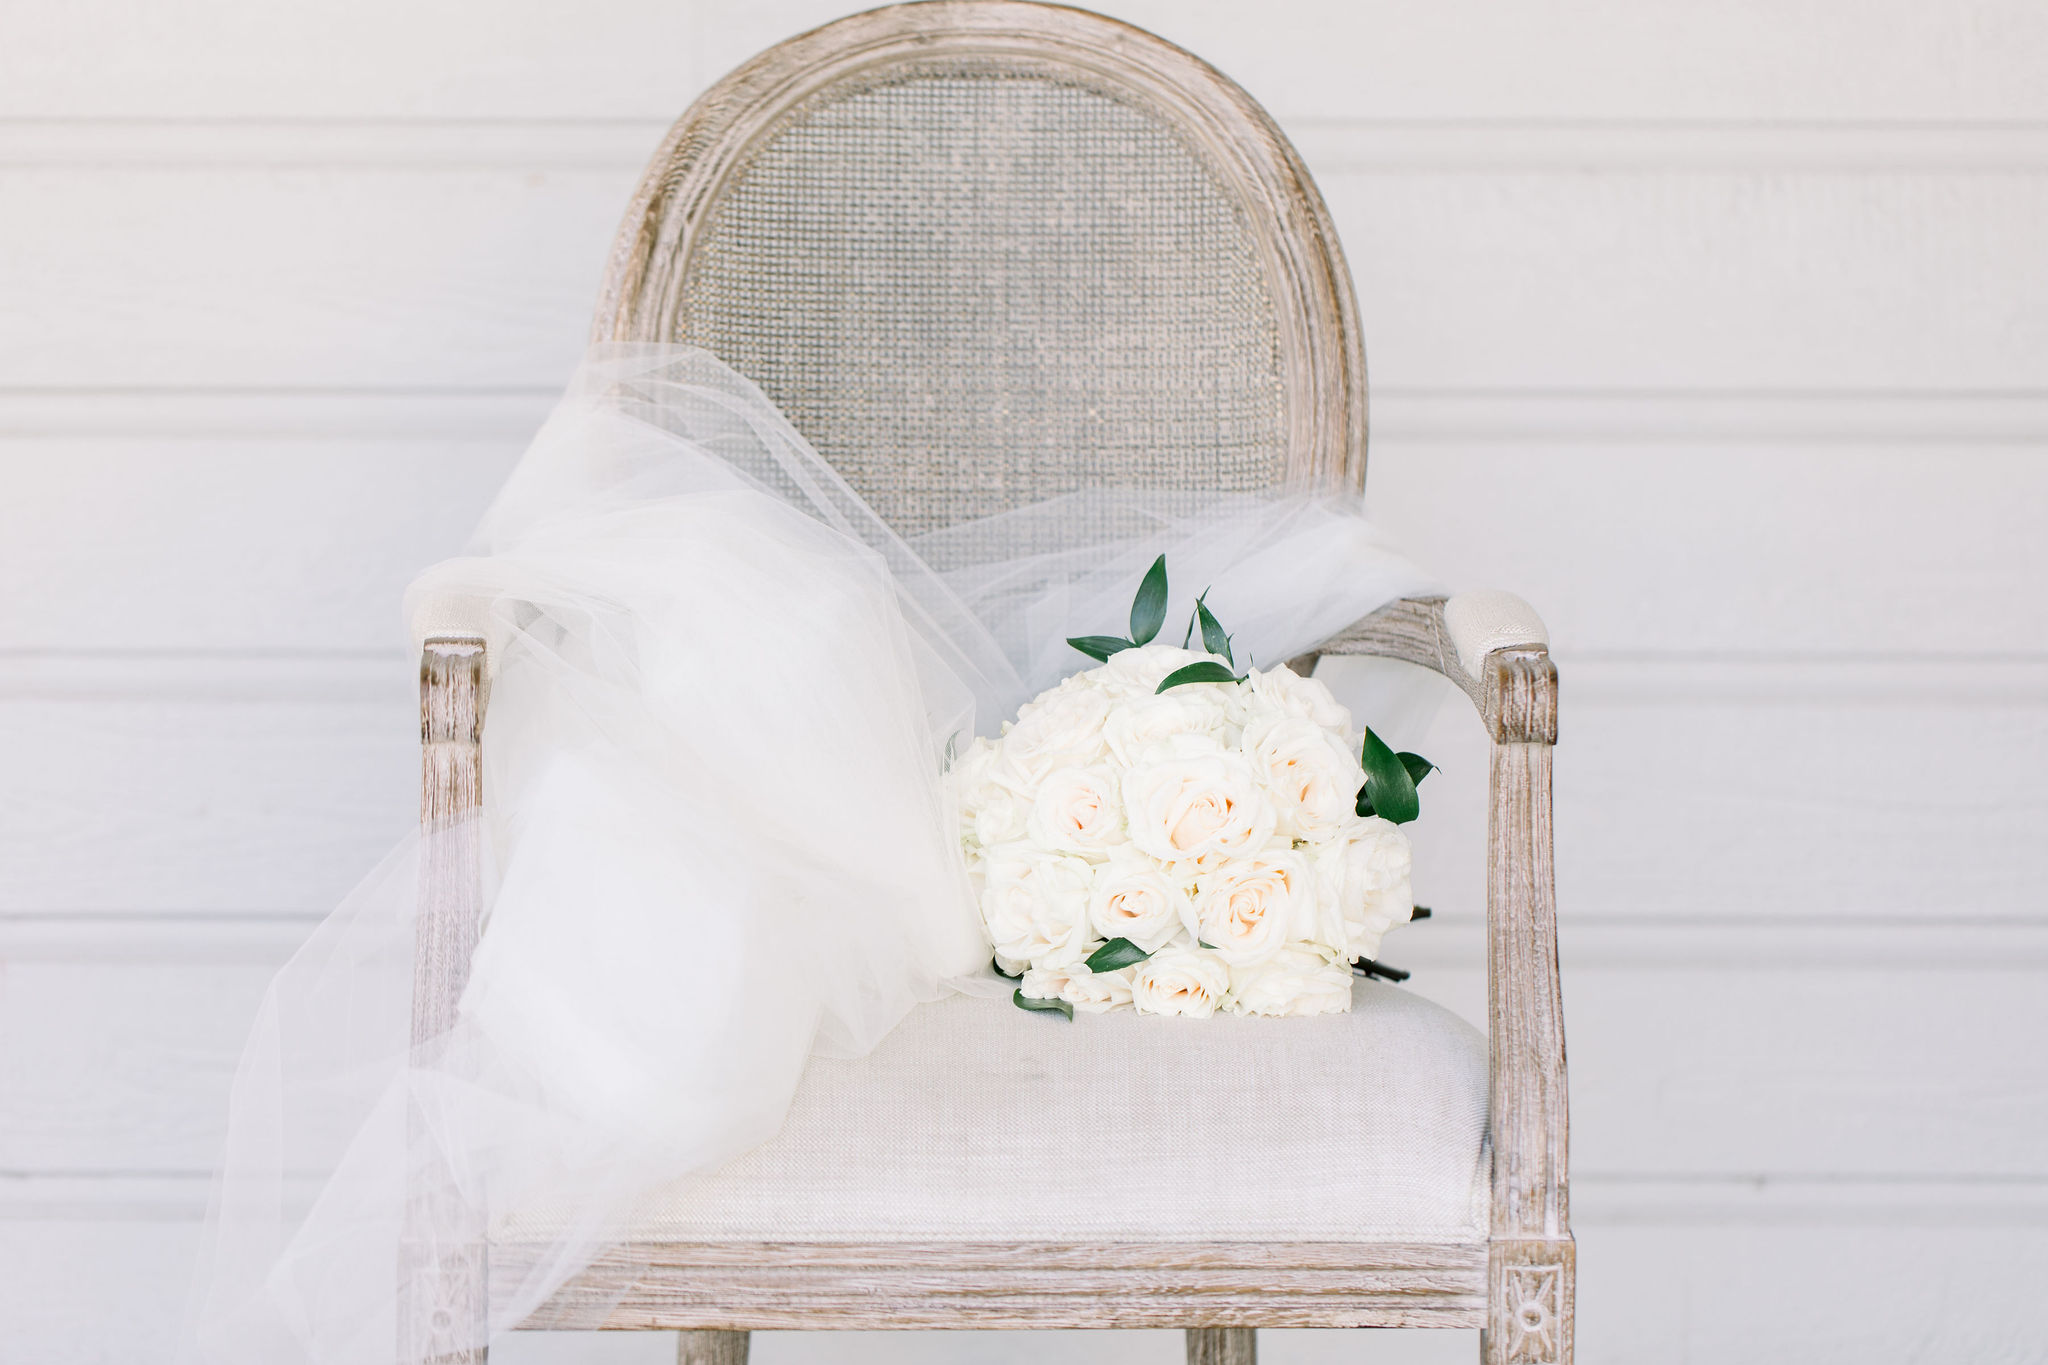 sydney-bodi-wedding-budget-friendly-blooms-carmel-mountain-white-flowers-1.jpg